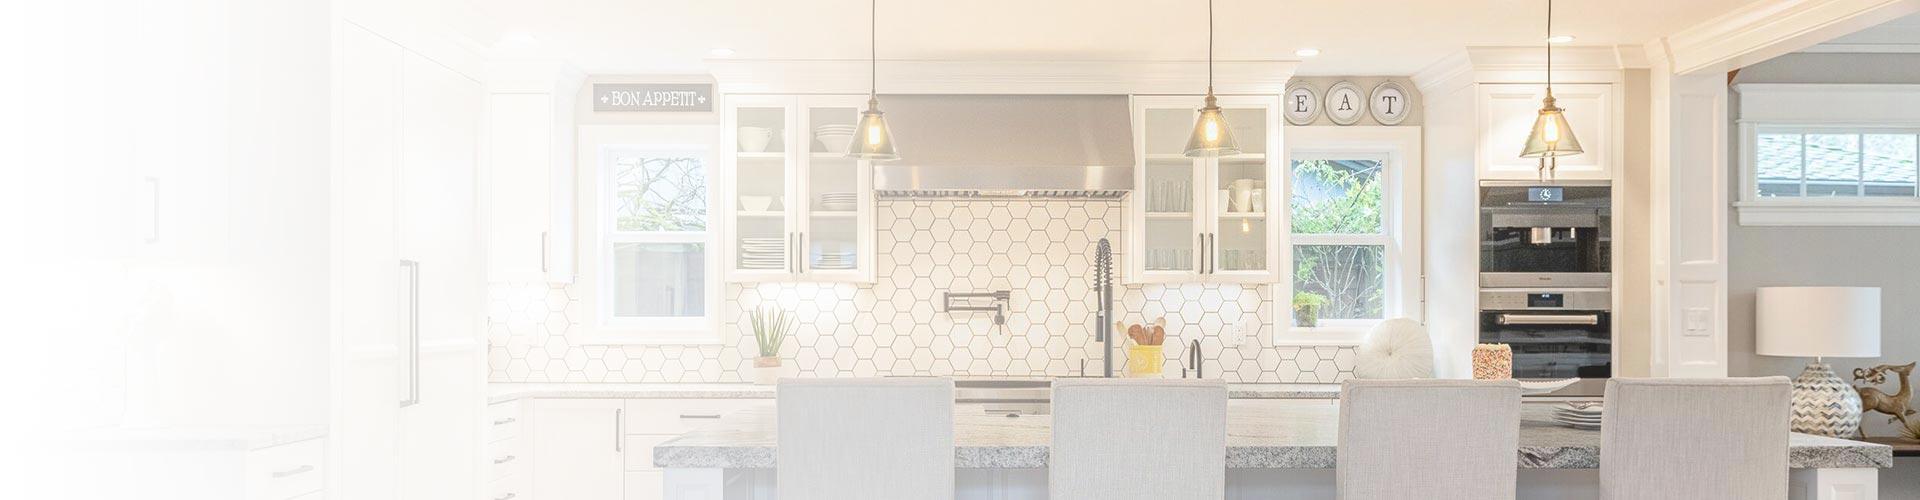 NWSID Kitchen Design